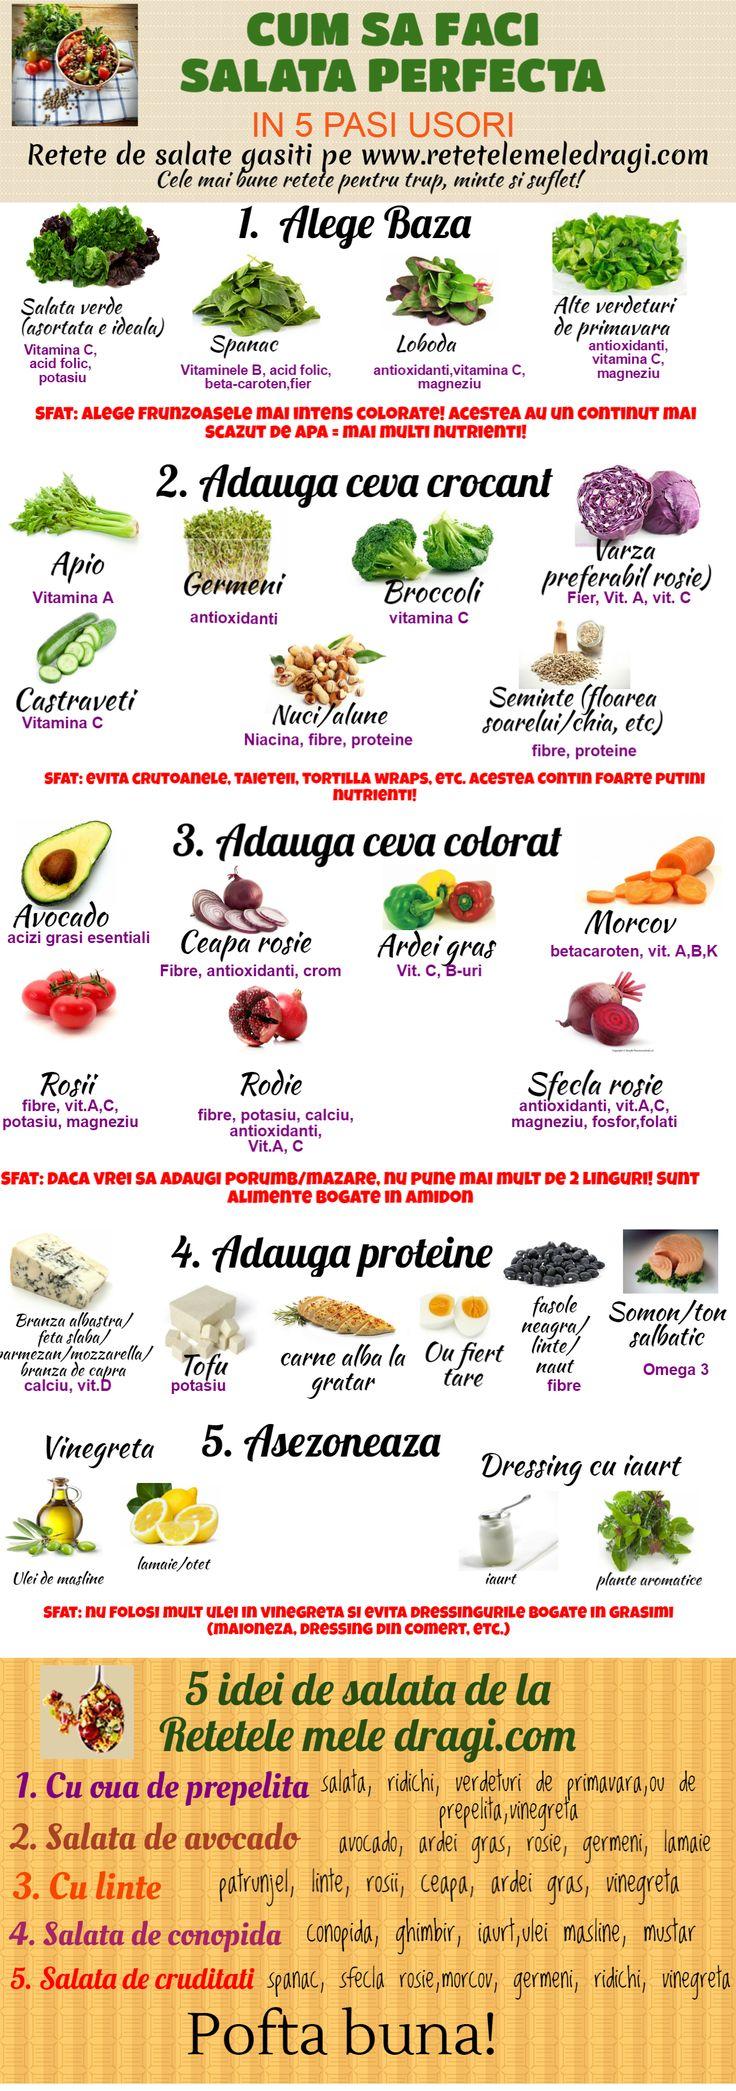 Cum sa faci salata perfecta infografic